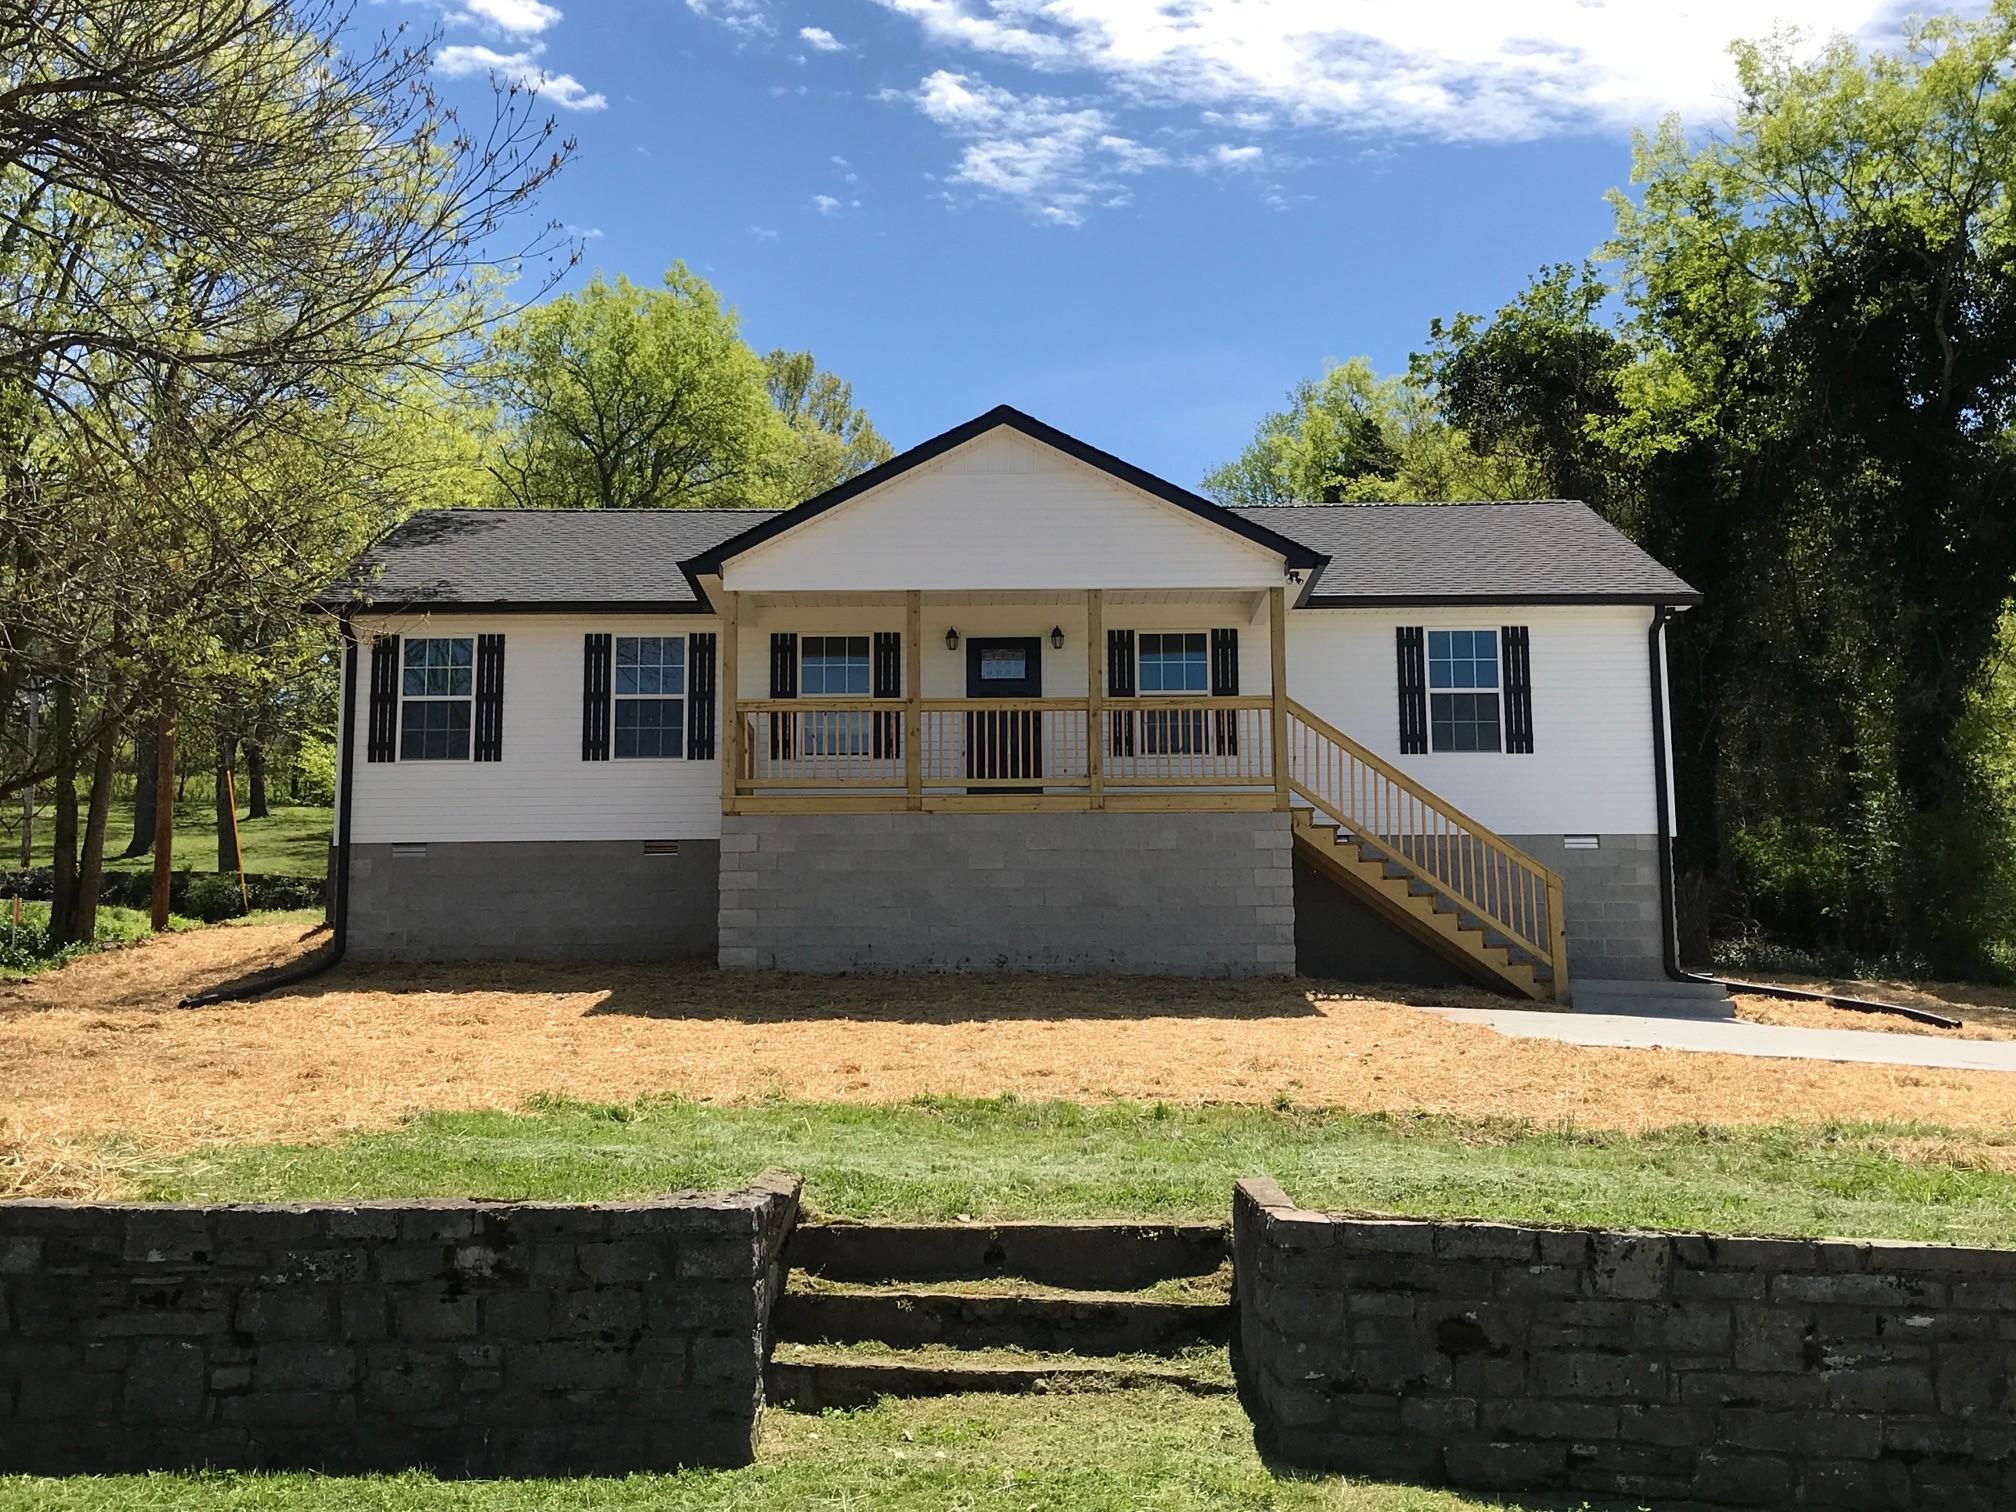 313 W Main St Property Photo - Hartsville, TN real estate listing